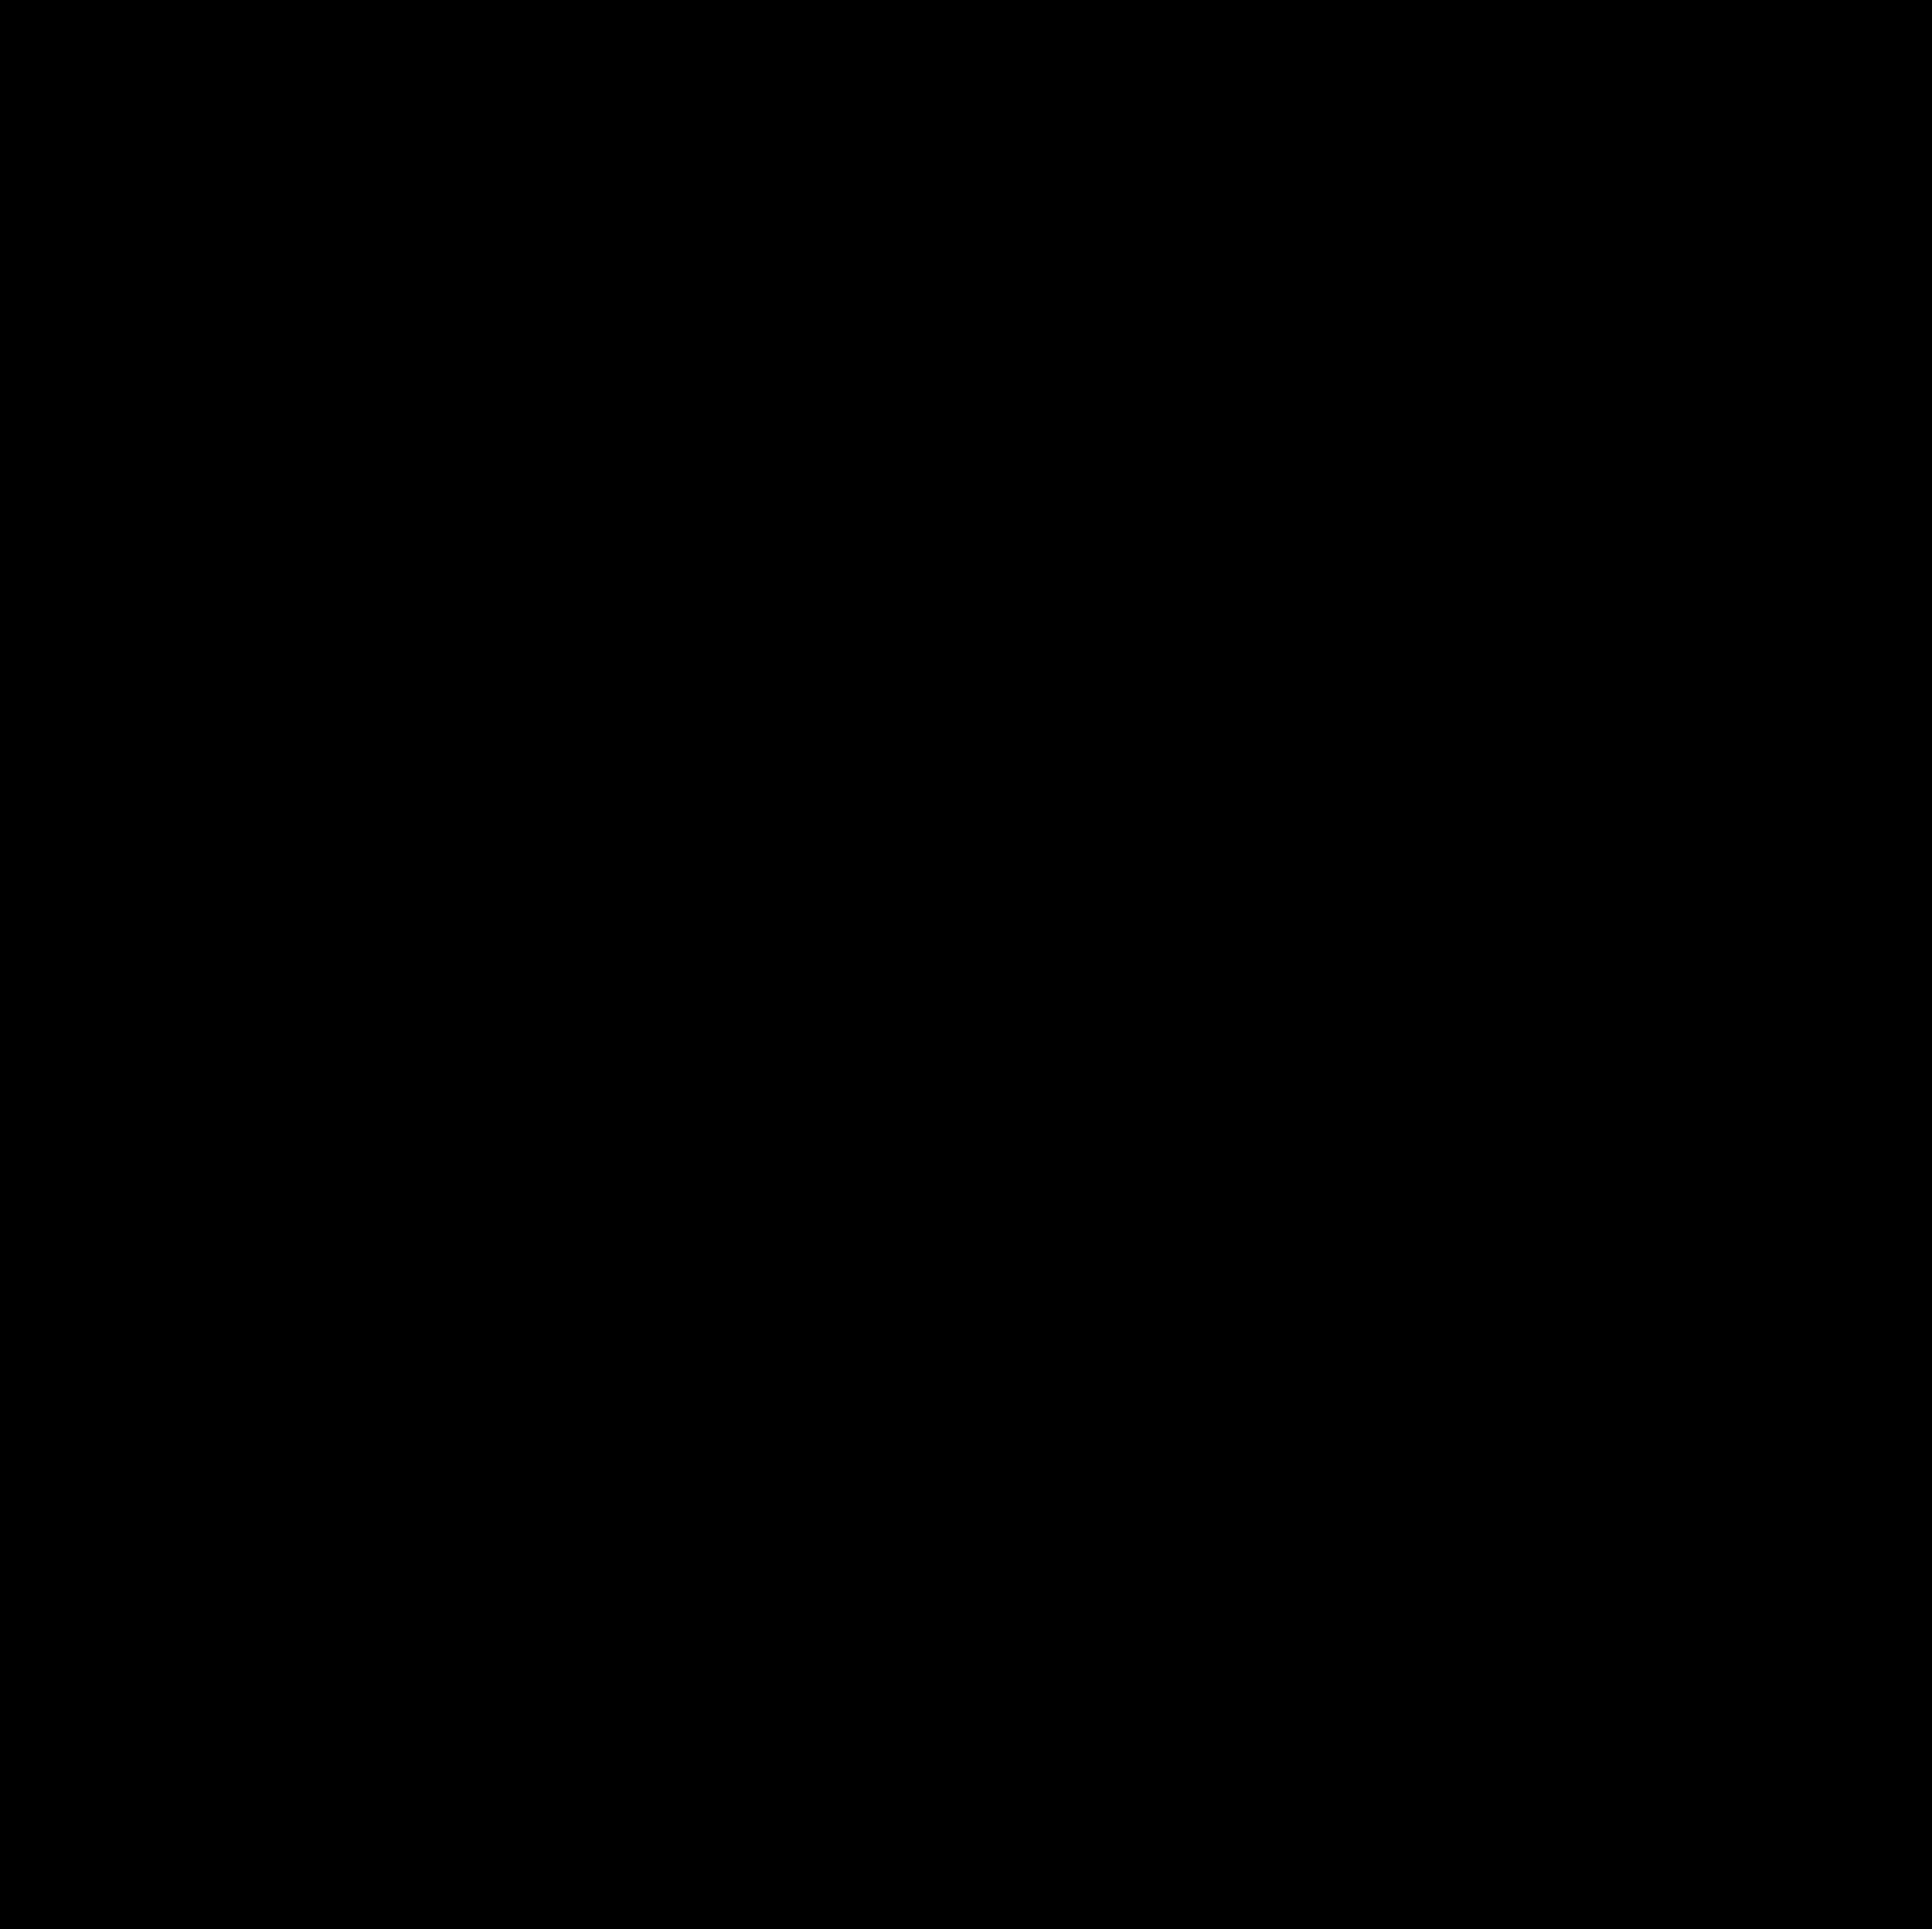 2400x2396 Maple Leaf Clipart Silhouette